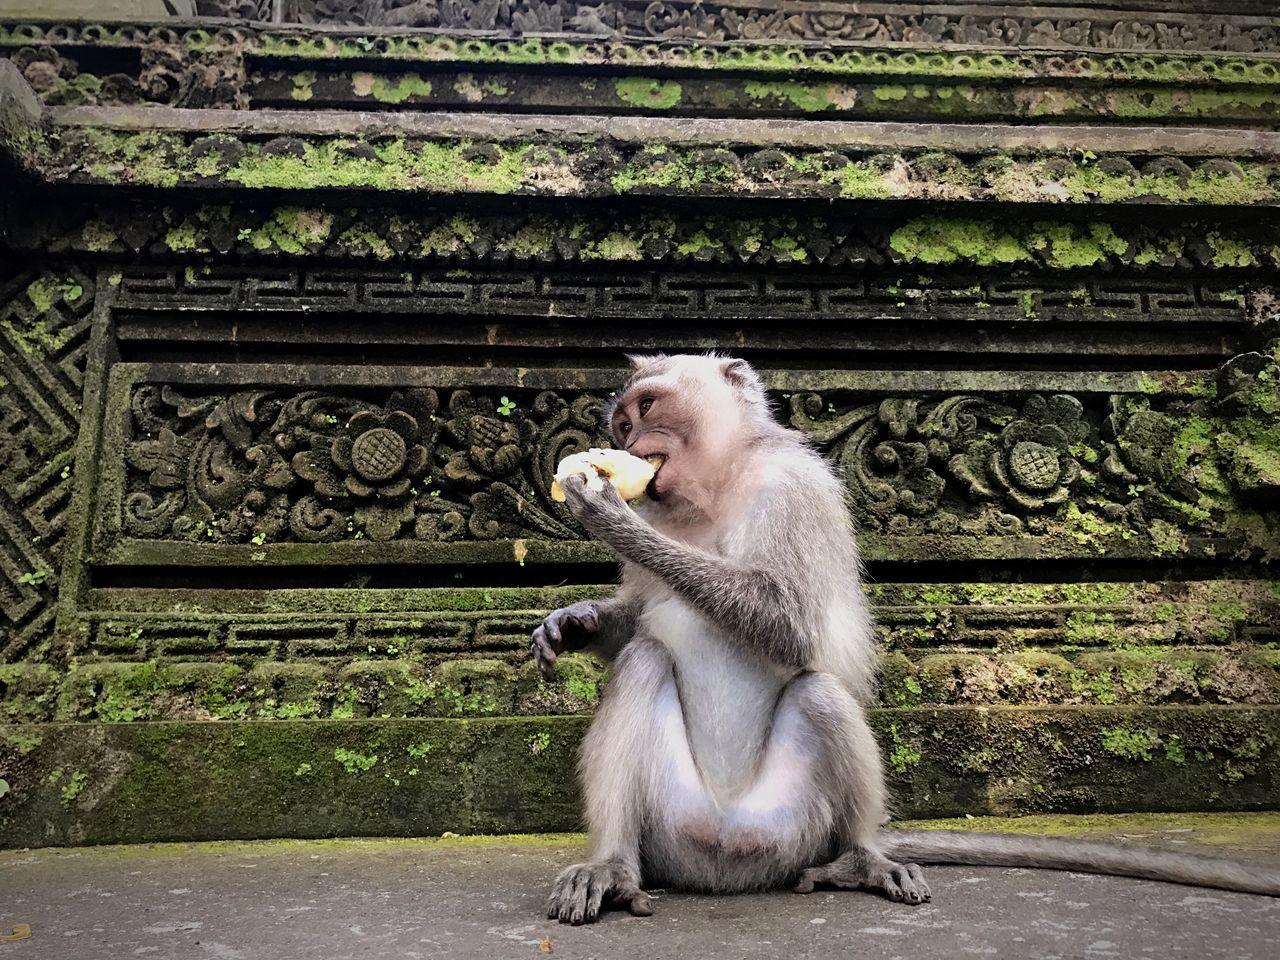 Monkey forest, ubud Monkey One Animal Sitting Side View Animal Themes Travel Destinations Beauty In Nature Ubud Photography INDONESIA Bali Primate MonkeyForest